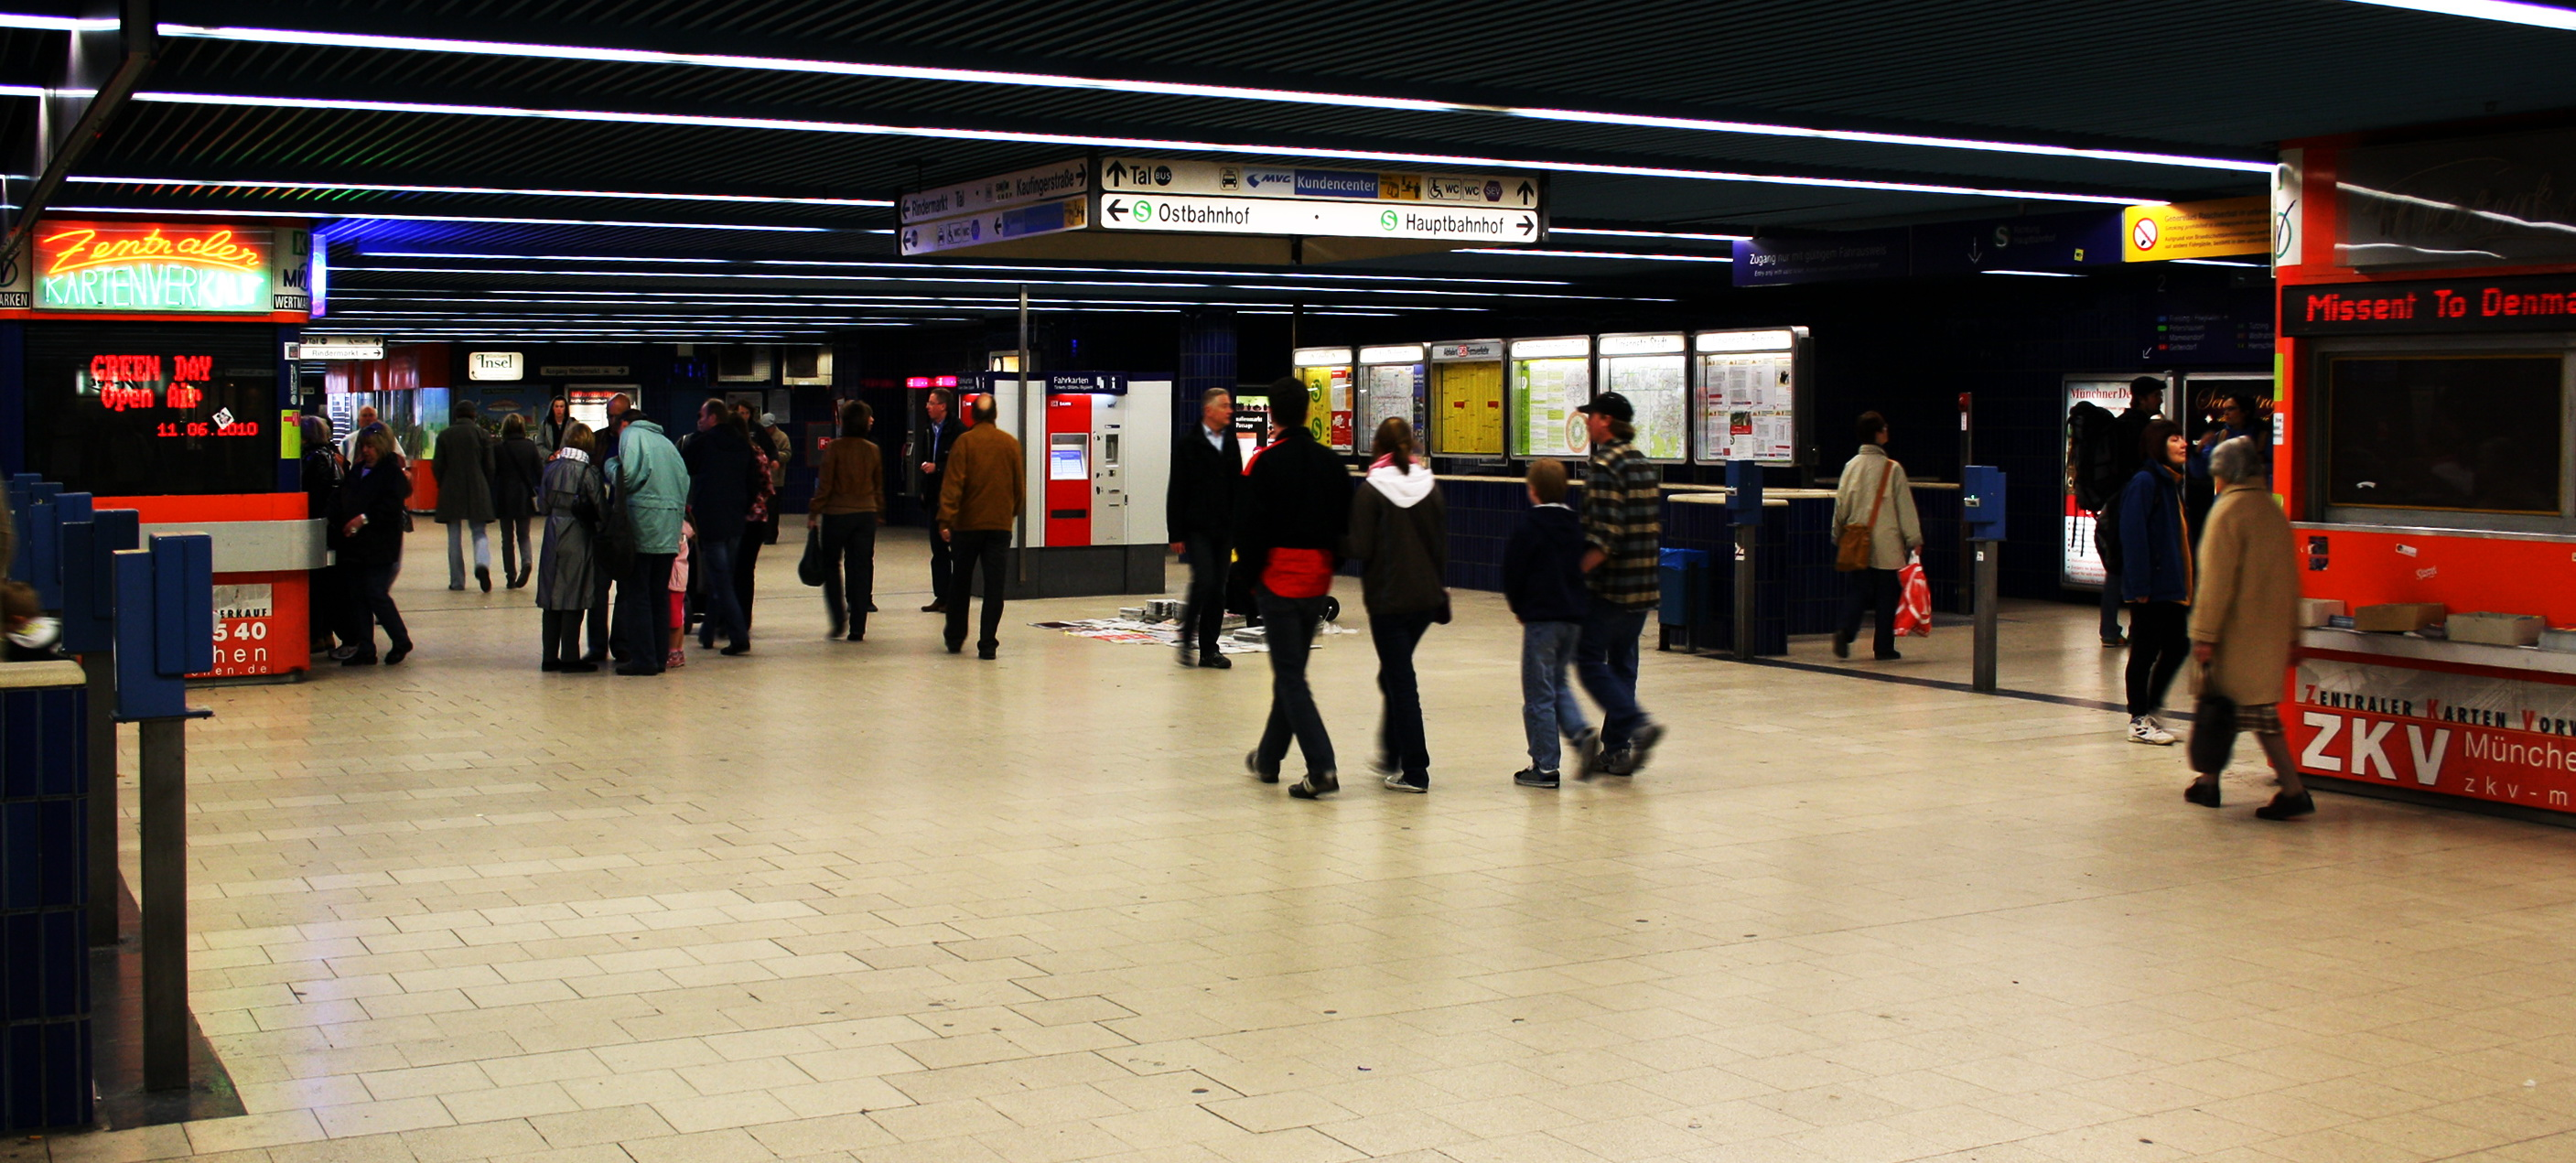 Marienplatz u bahn and s bahn station